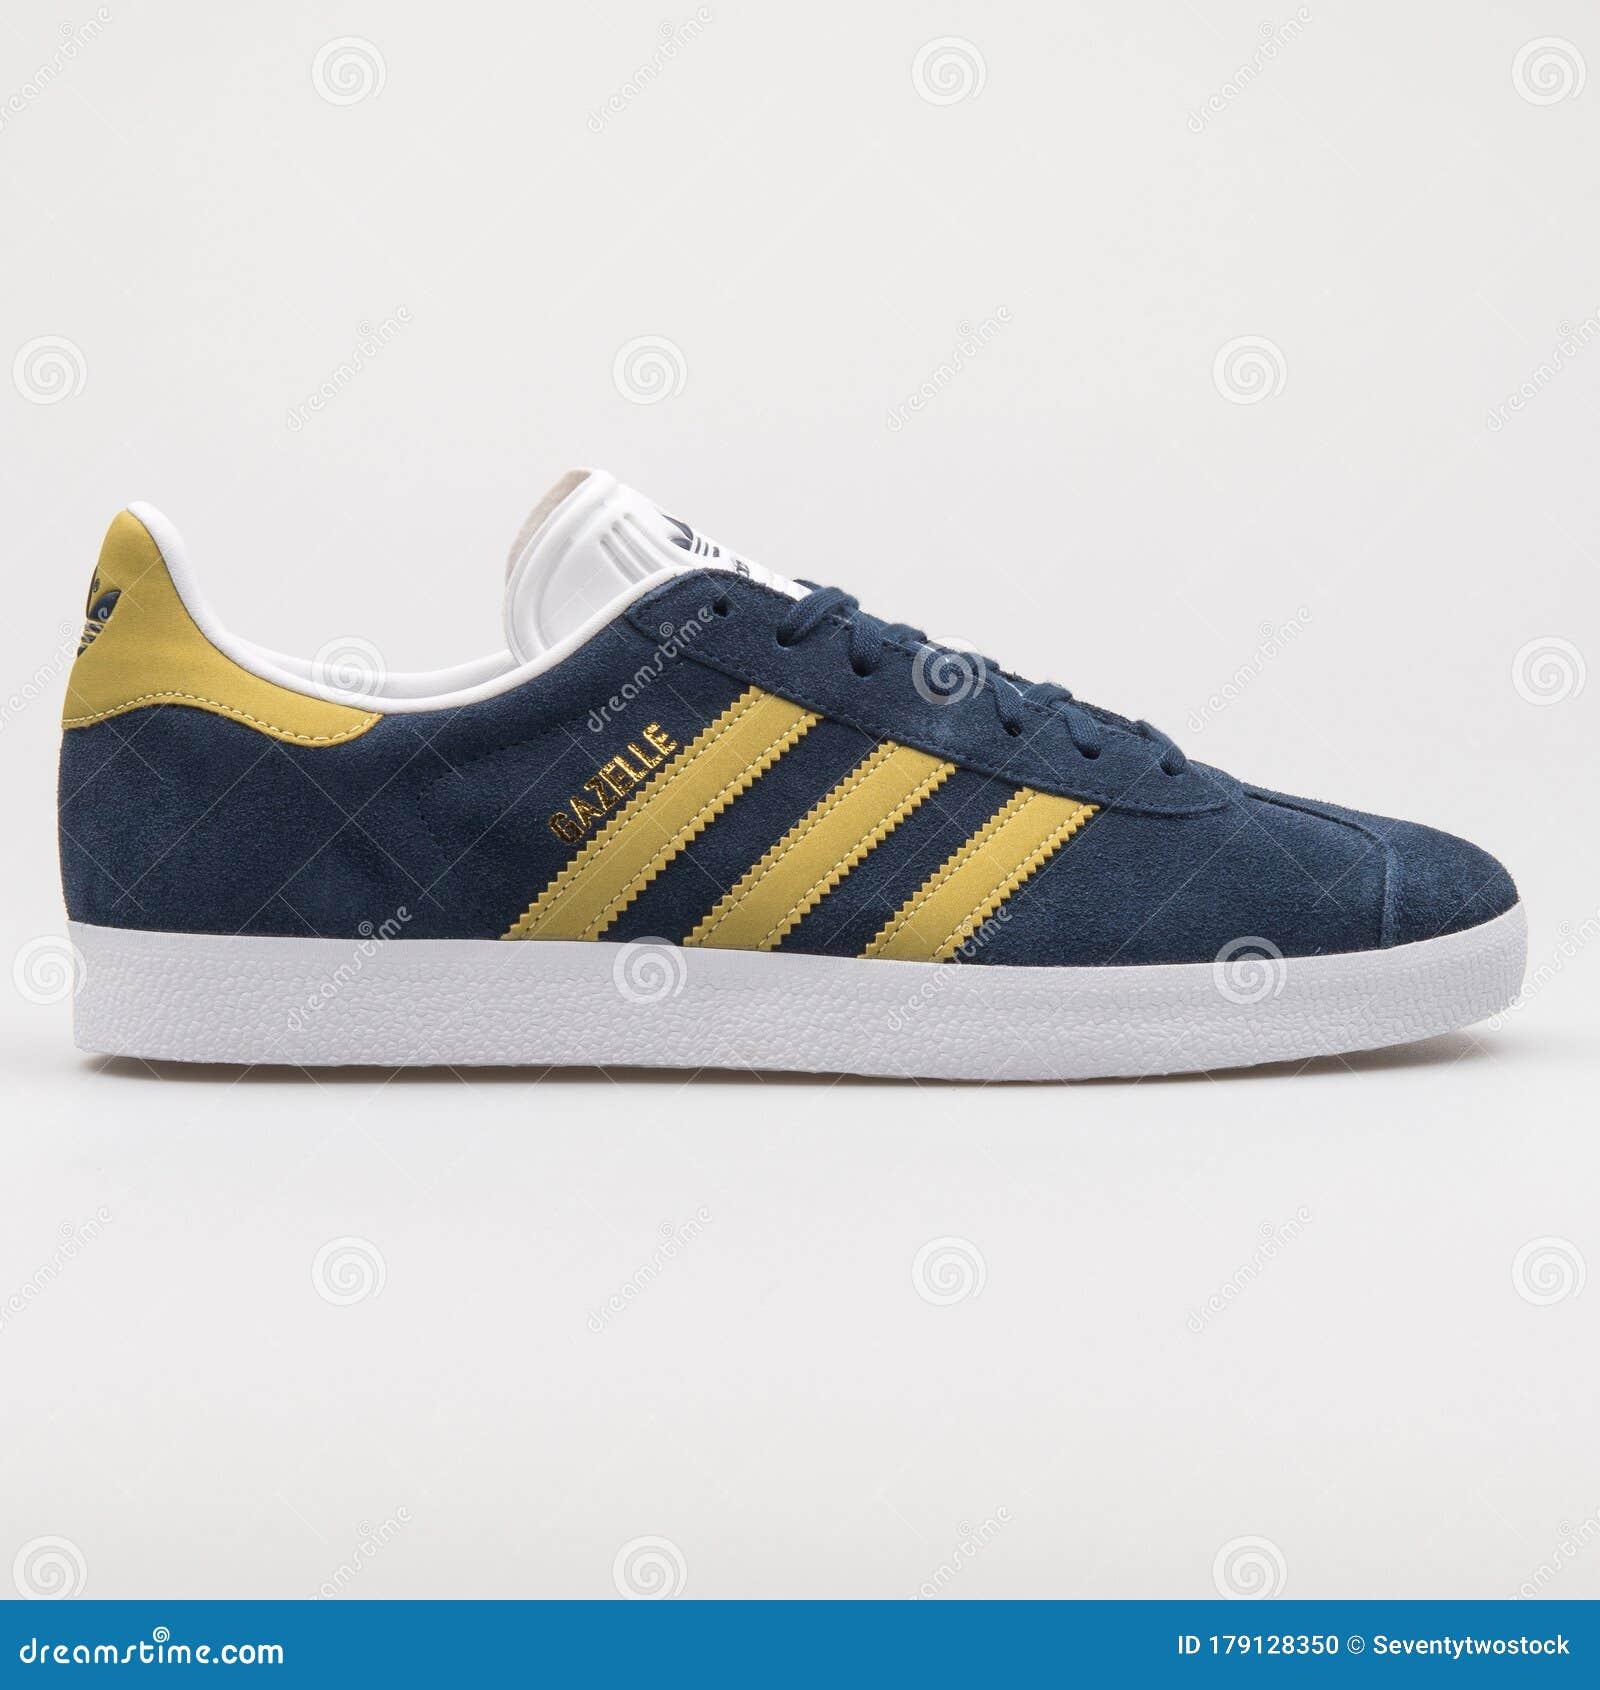 Adidas Gazelle Photos - Free & Royalty-Free Stock Photos from ...